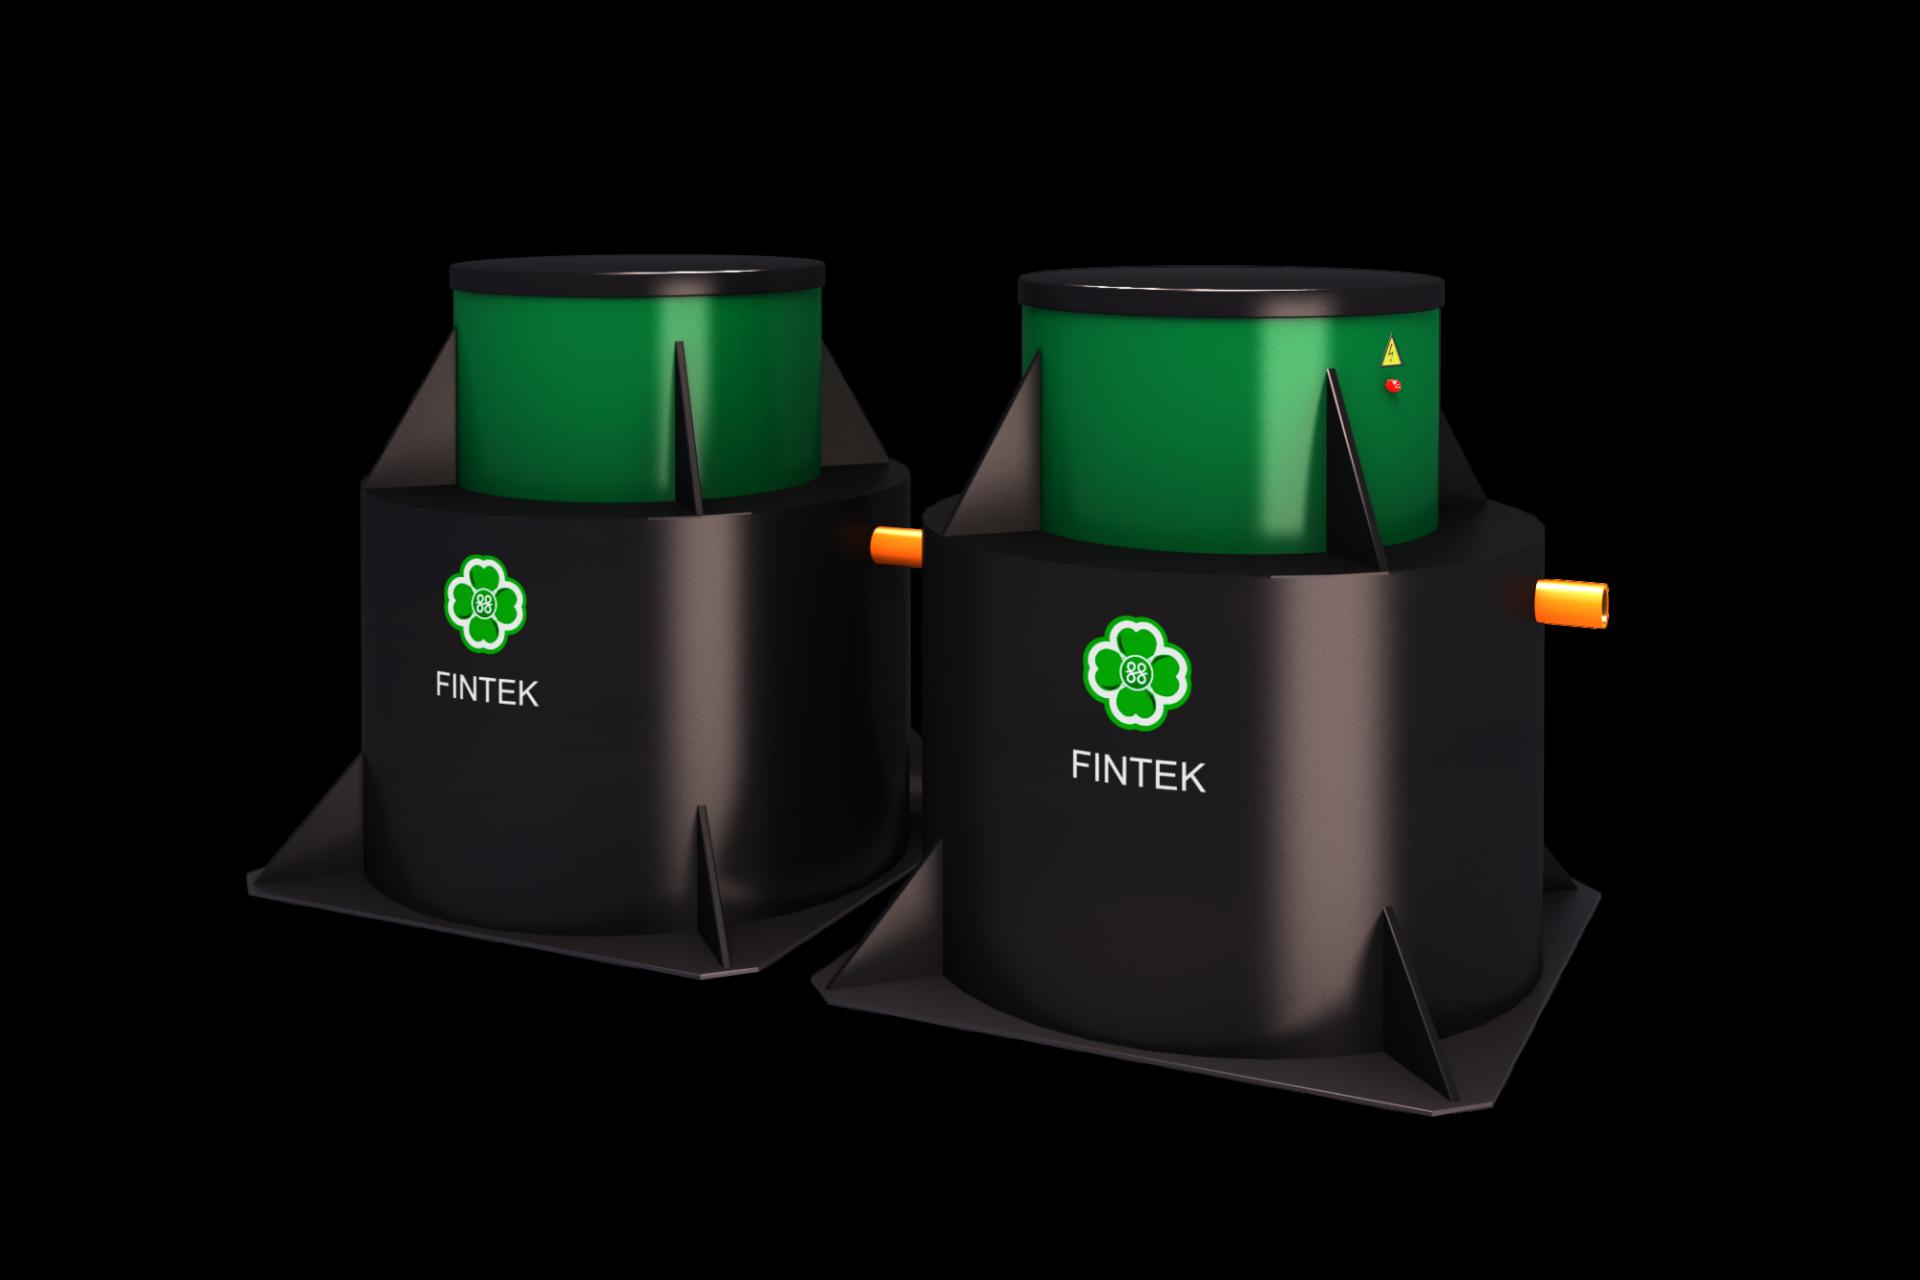 Септик ЭКО-ЕНОТ ФИНТЕК (FINTEK) 2.5